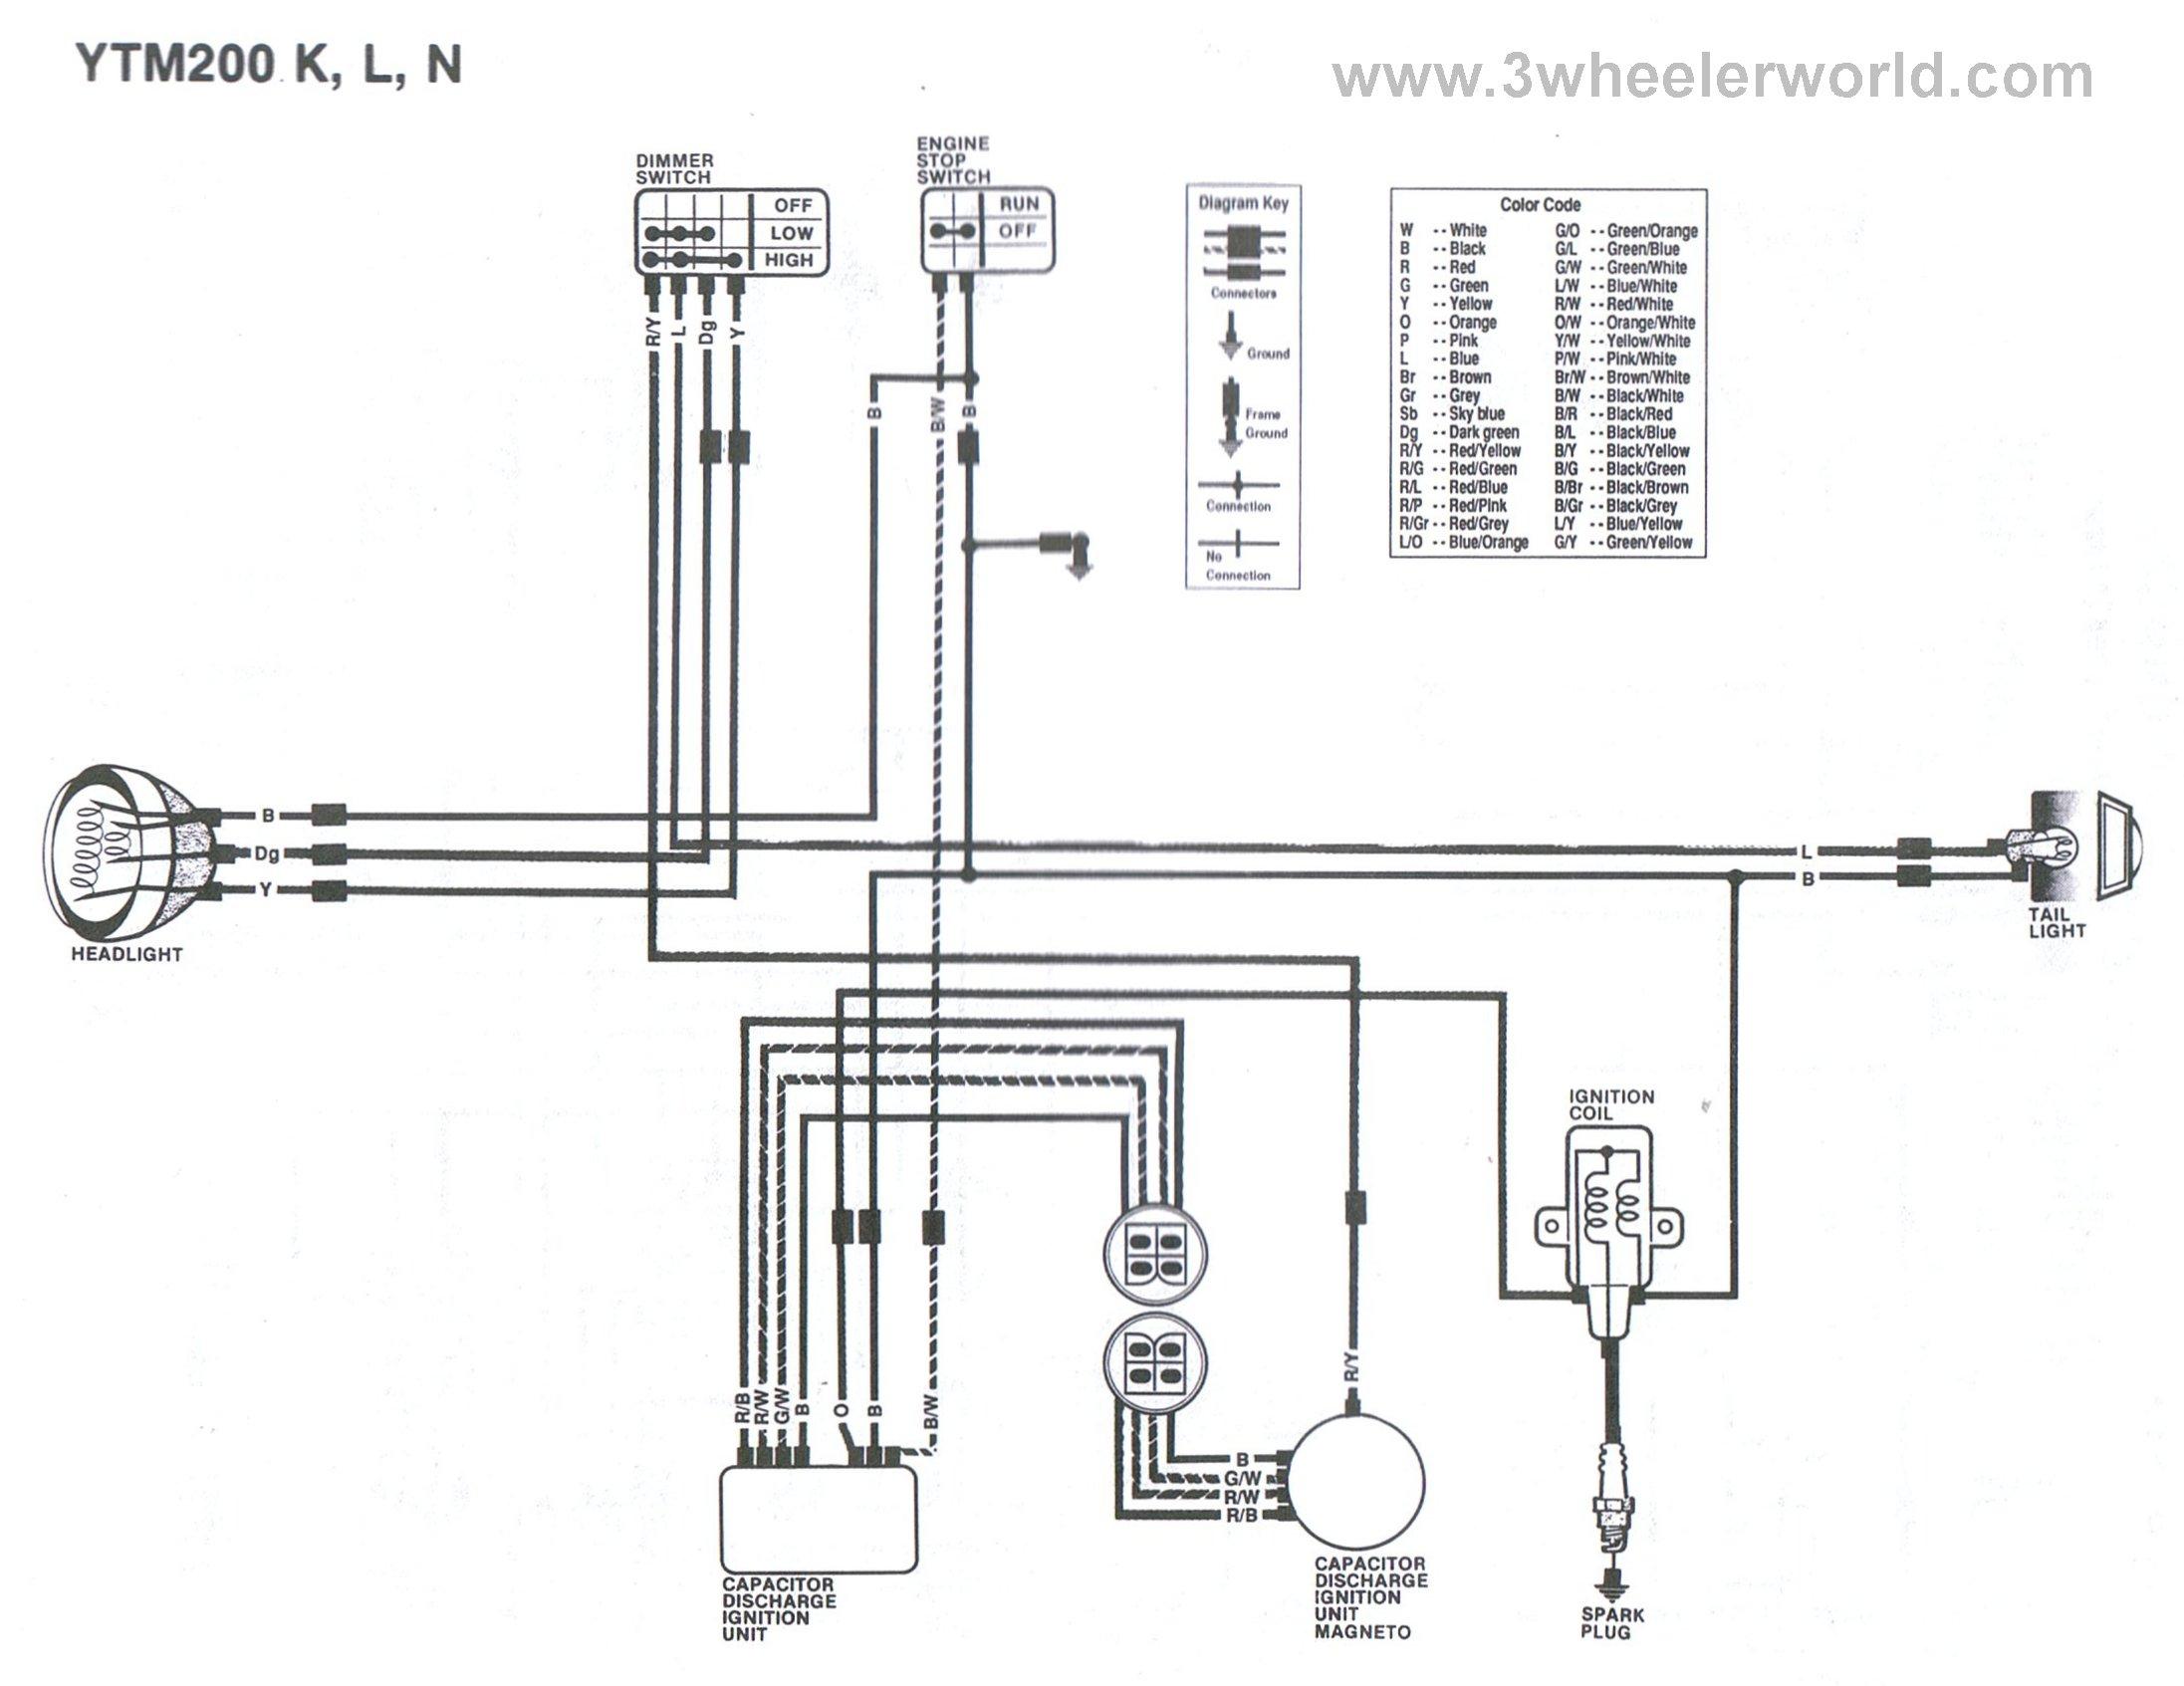 YTM200KLN?resize=665%2C513 1990 yamaha moto 4 350 wiring diagram wiring diagram Yamaha YFM350 Big Bear at cos-gaming.co